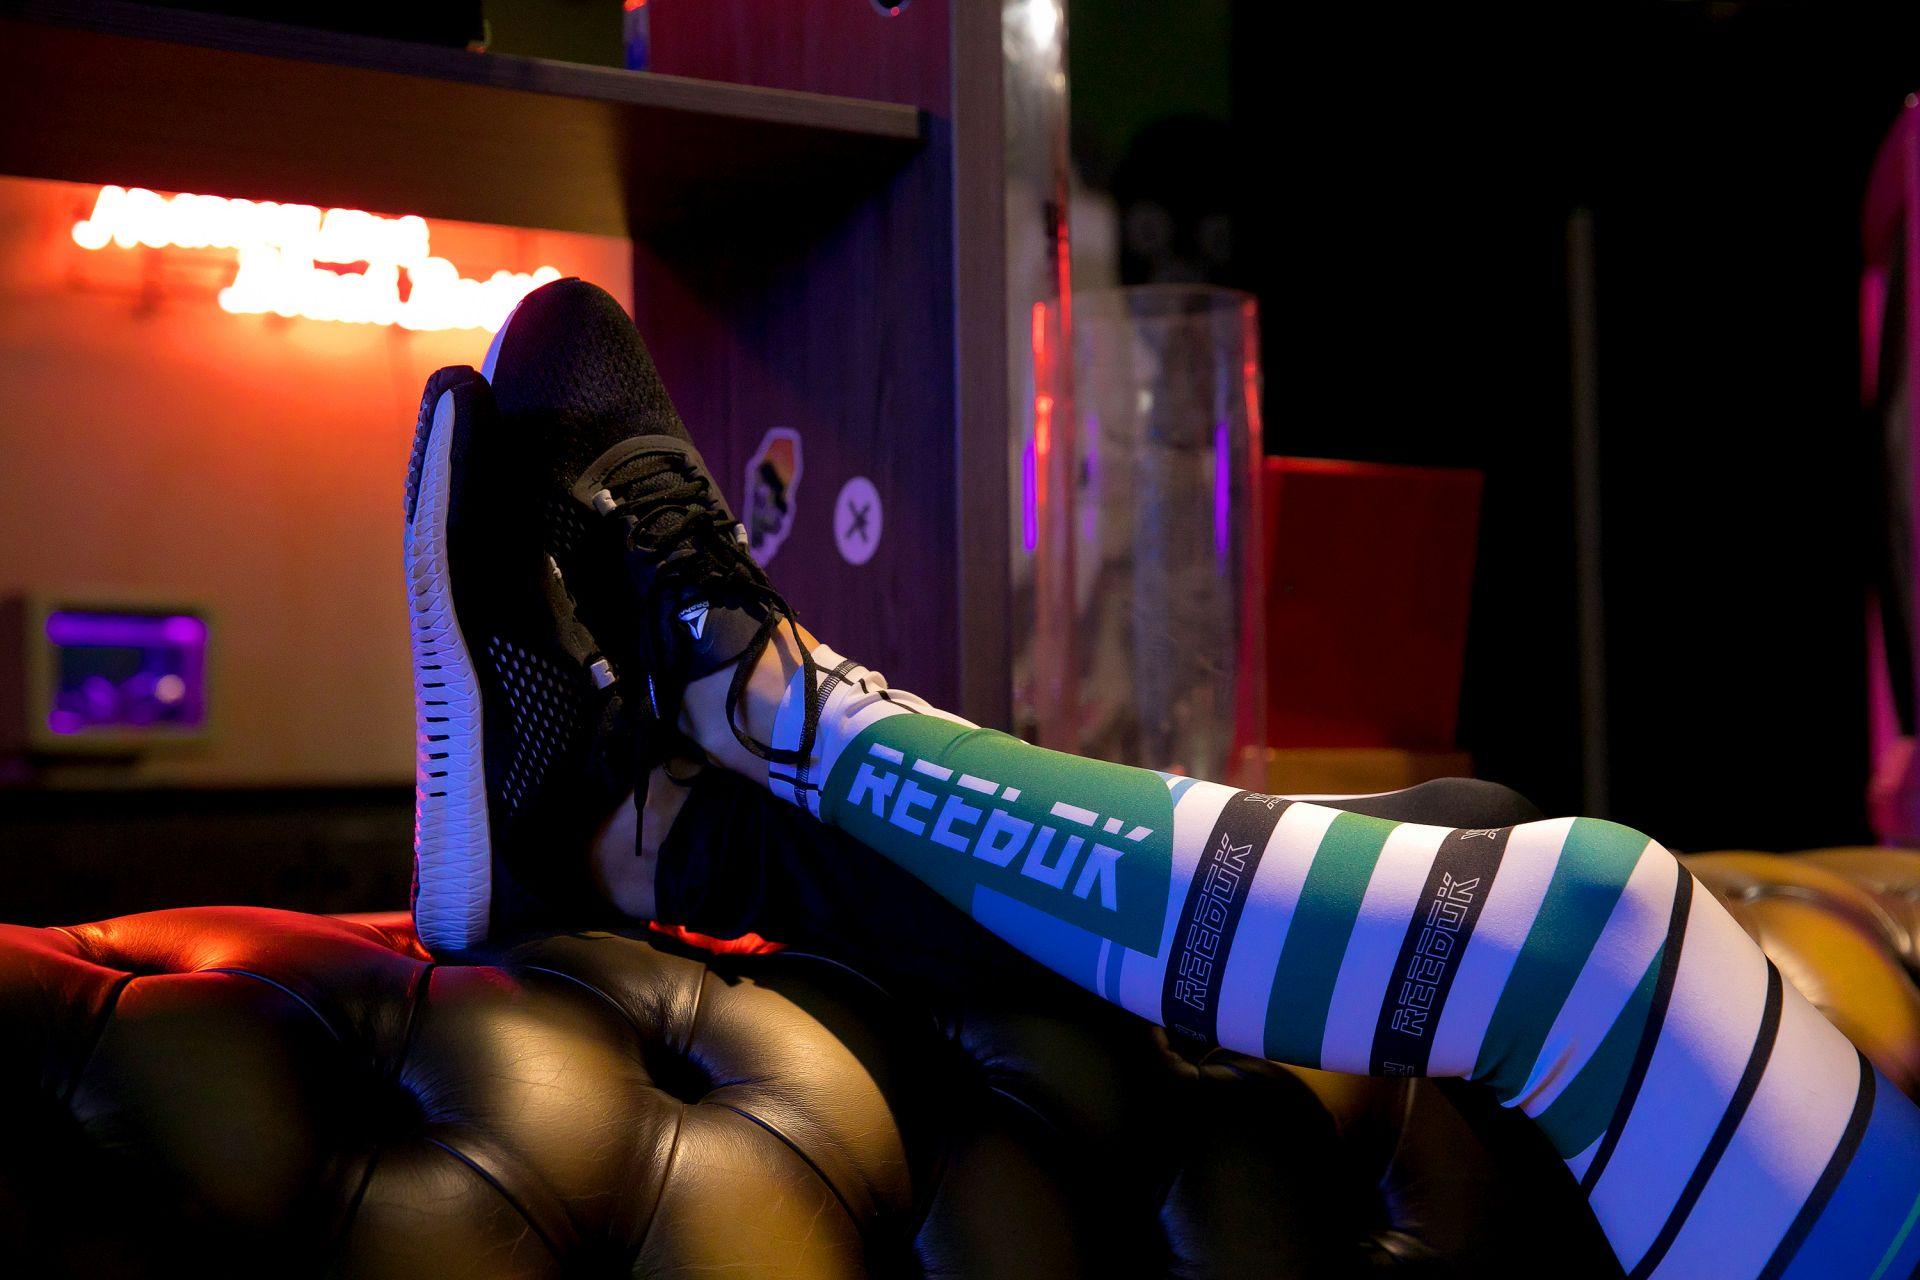 Гардероб Sport Depot, марка Reebok, колекция Meet You There